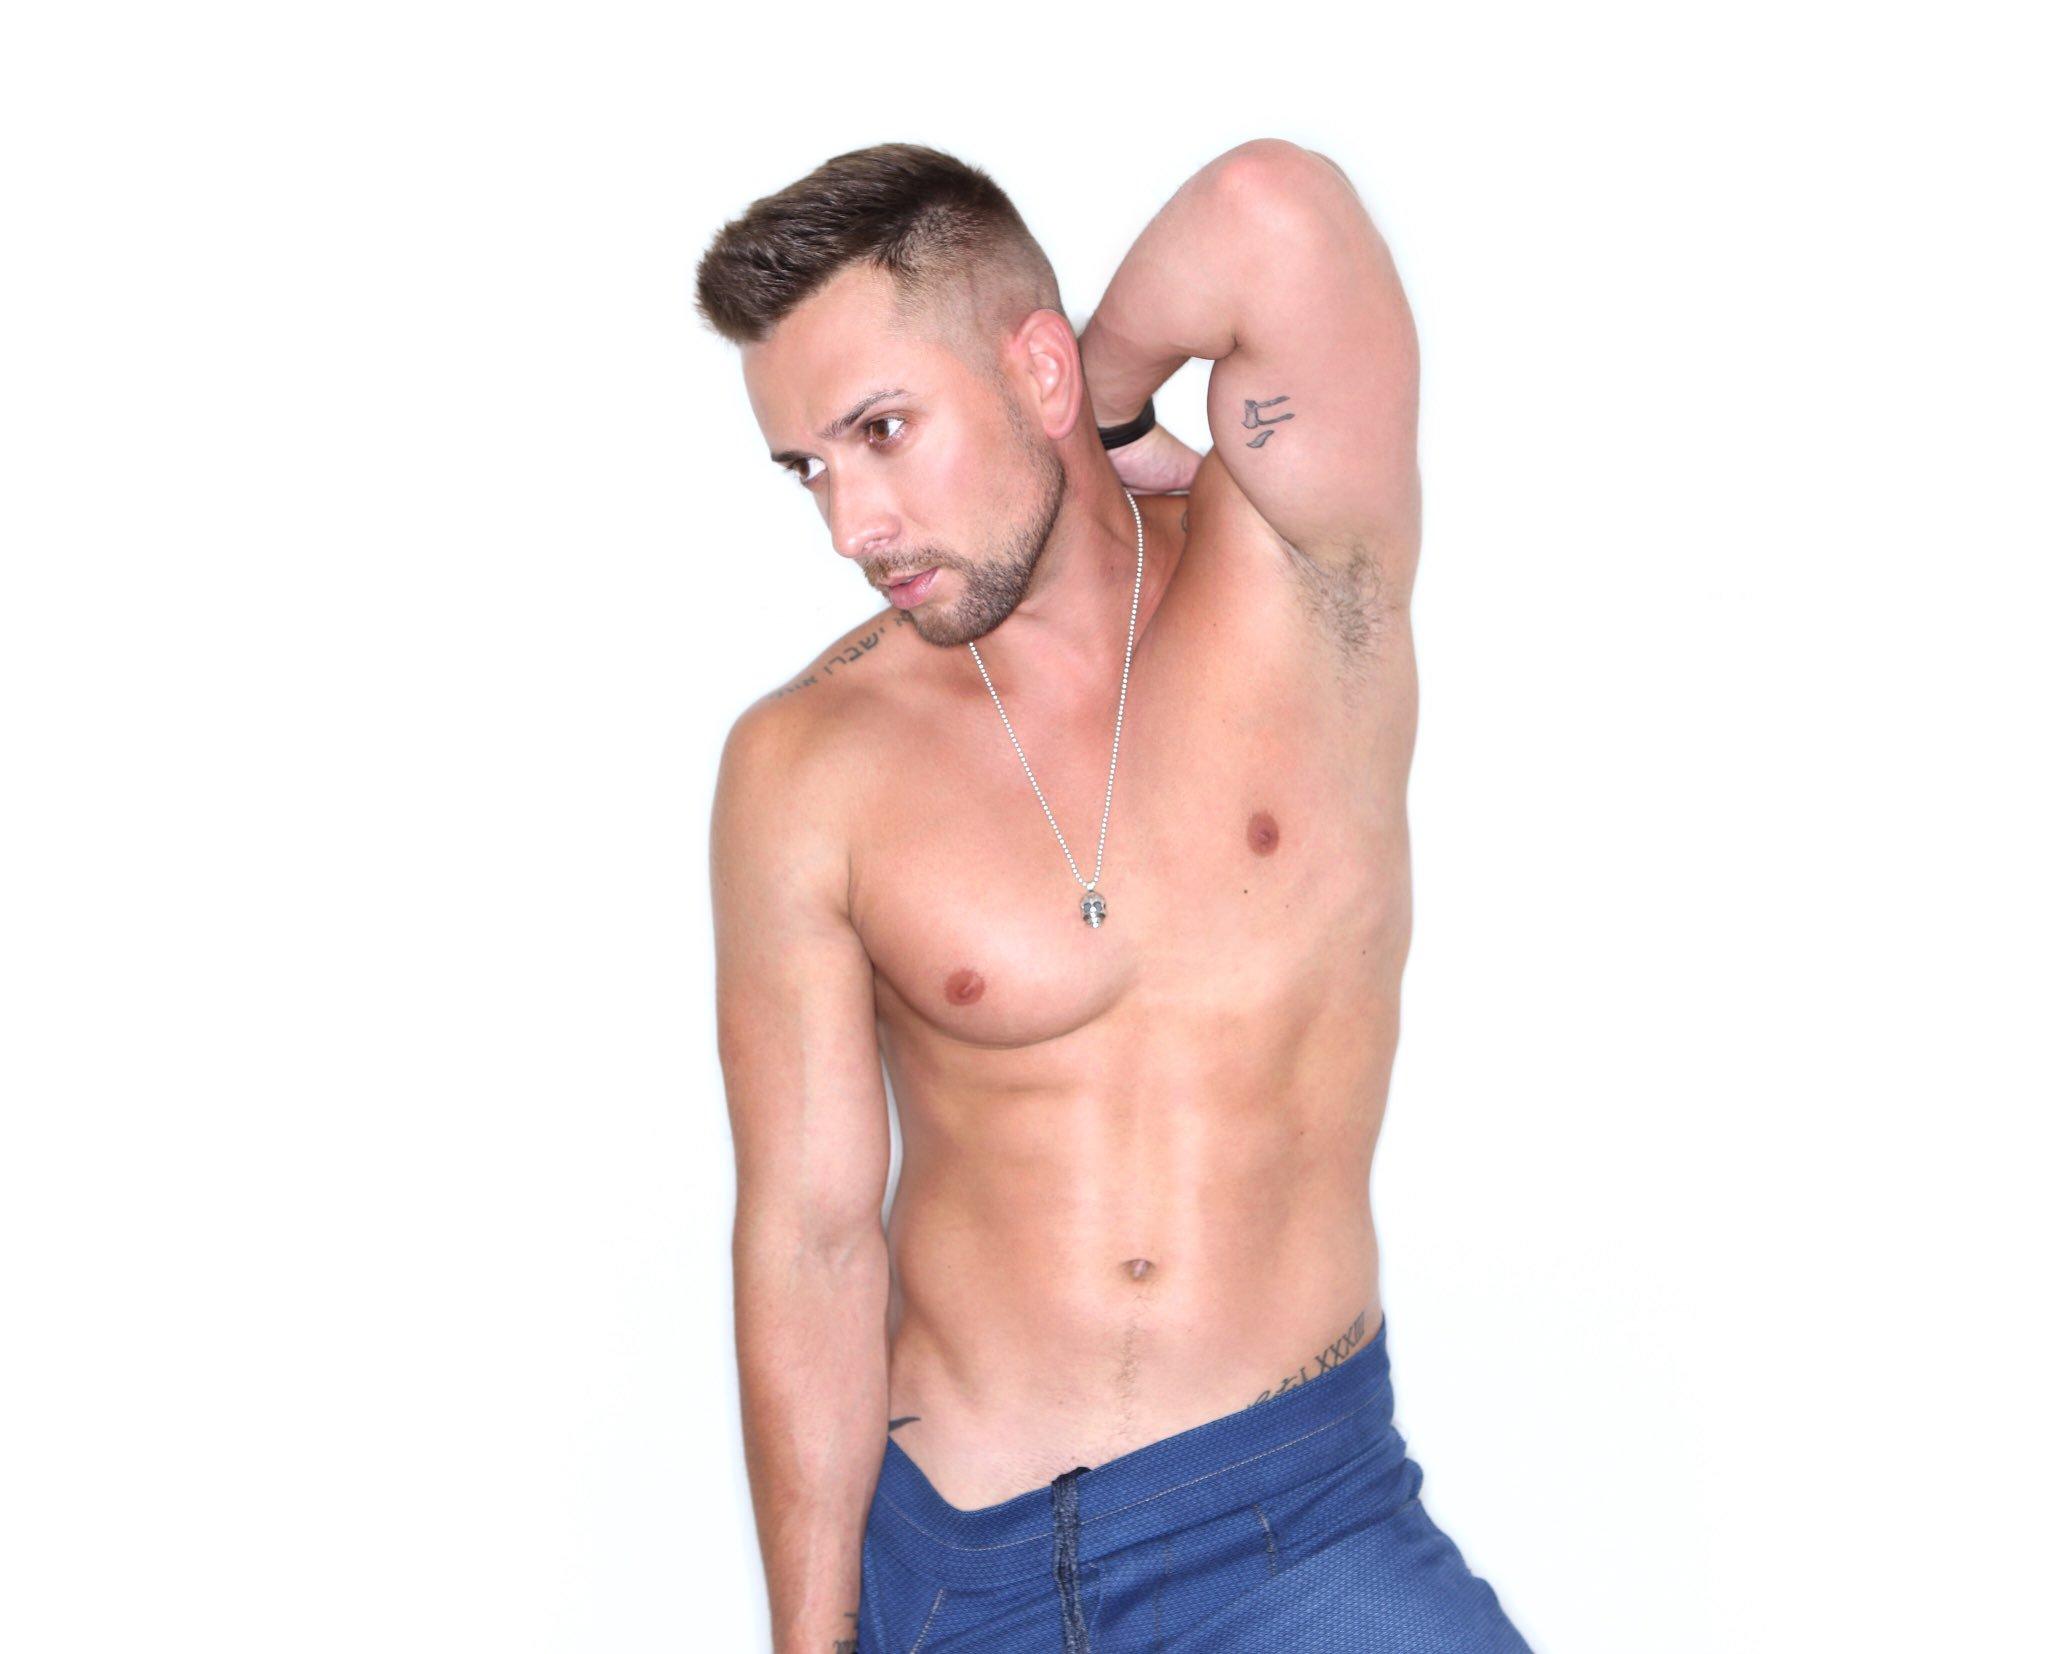 Gay stripper david hernandez